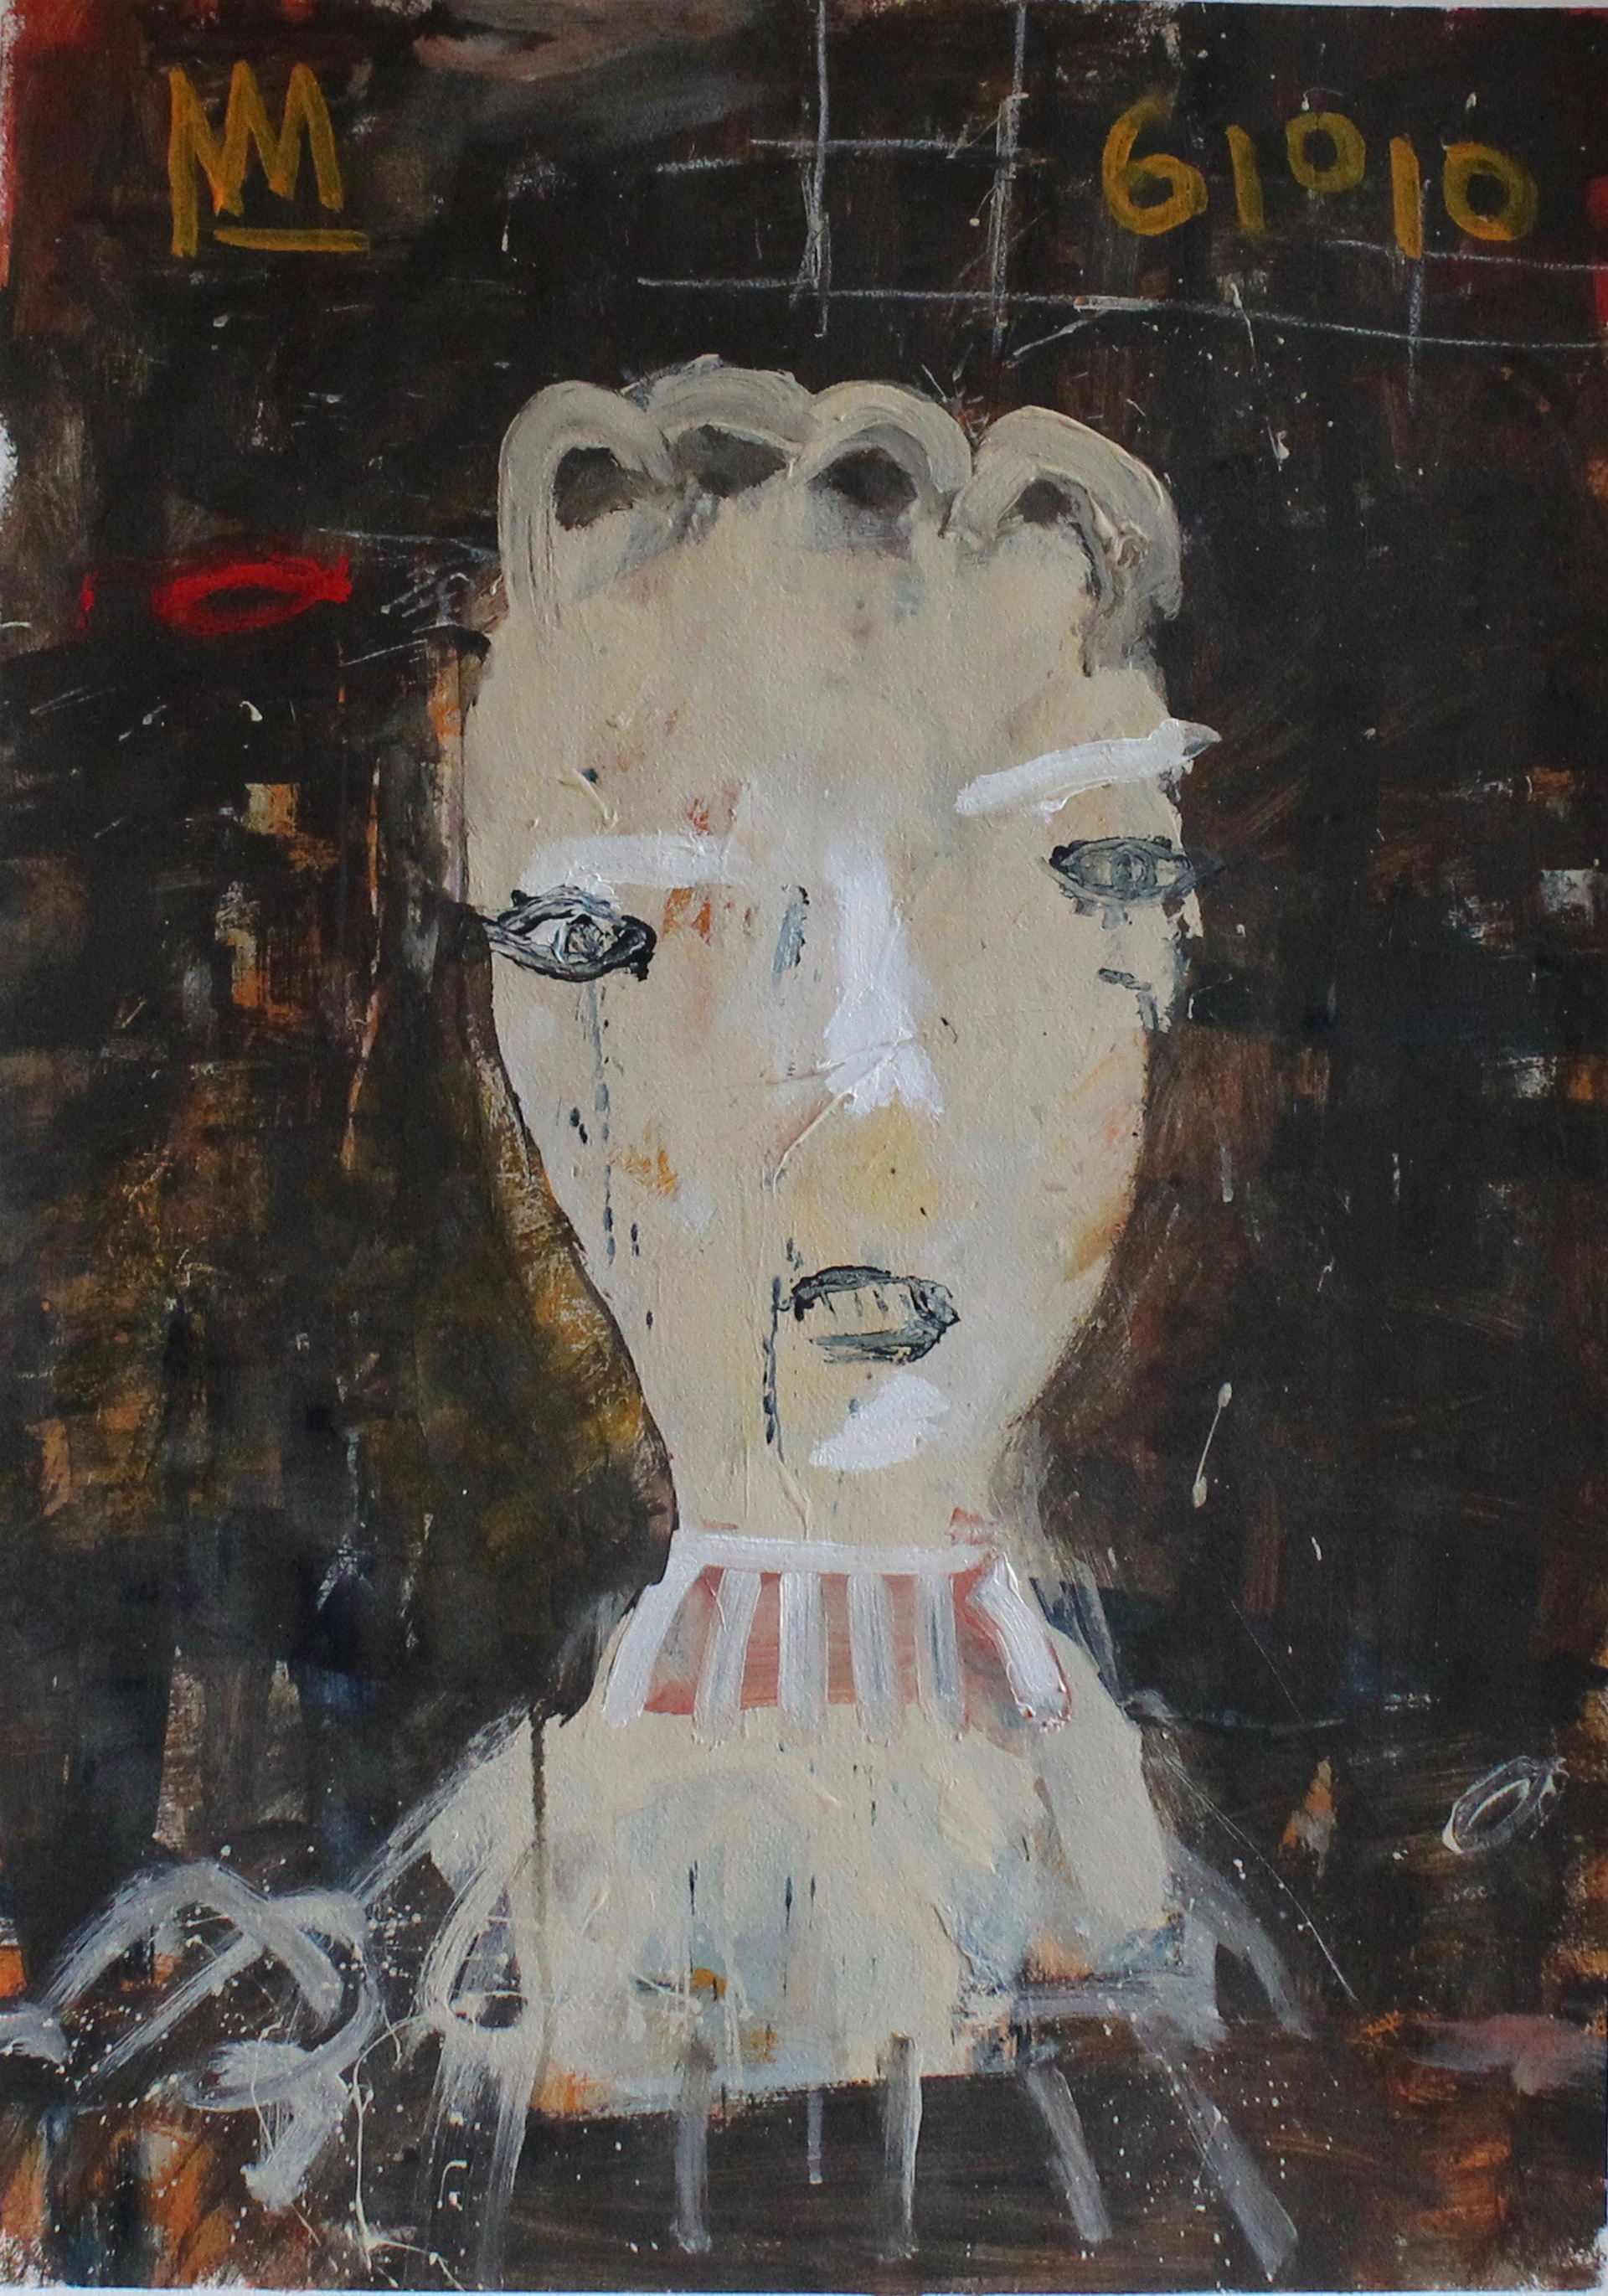 French Farm Girl by Michael Snodgrass